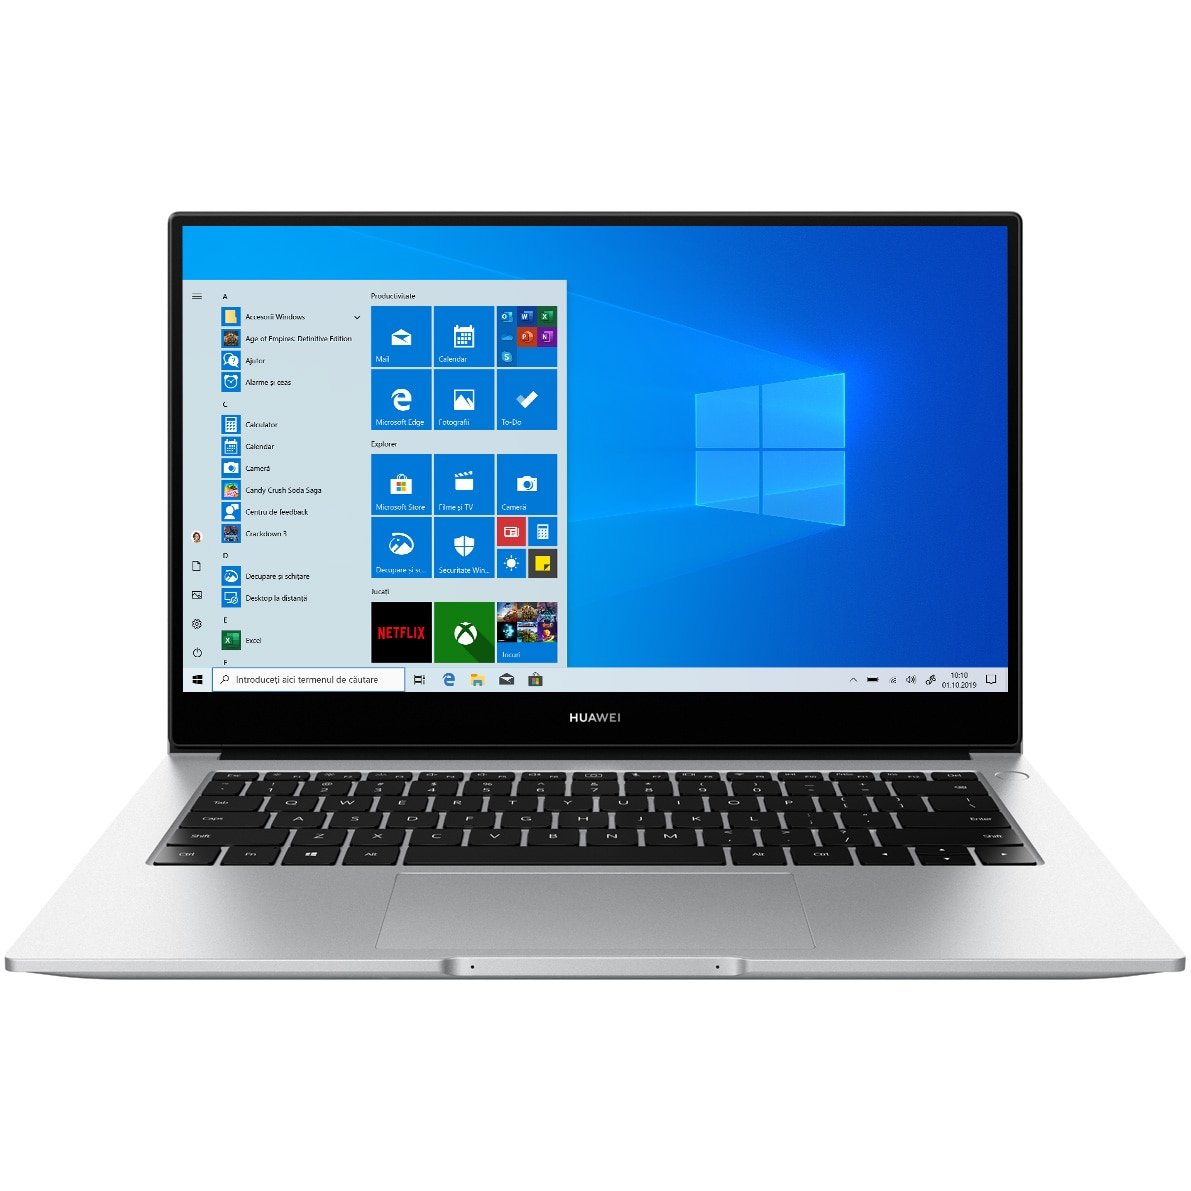 "Fotografie Laptop ultraportabil Huawei MateBook D14 2020 cu procesor AMD Ryzen™ 7 3700U pana la 4.00 GHz, 14"", Full HD, 8GB, 512GB SSD, AMD Radeon Graphics, Windows 10 Home, Silver"